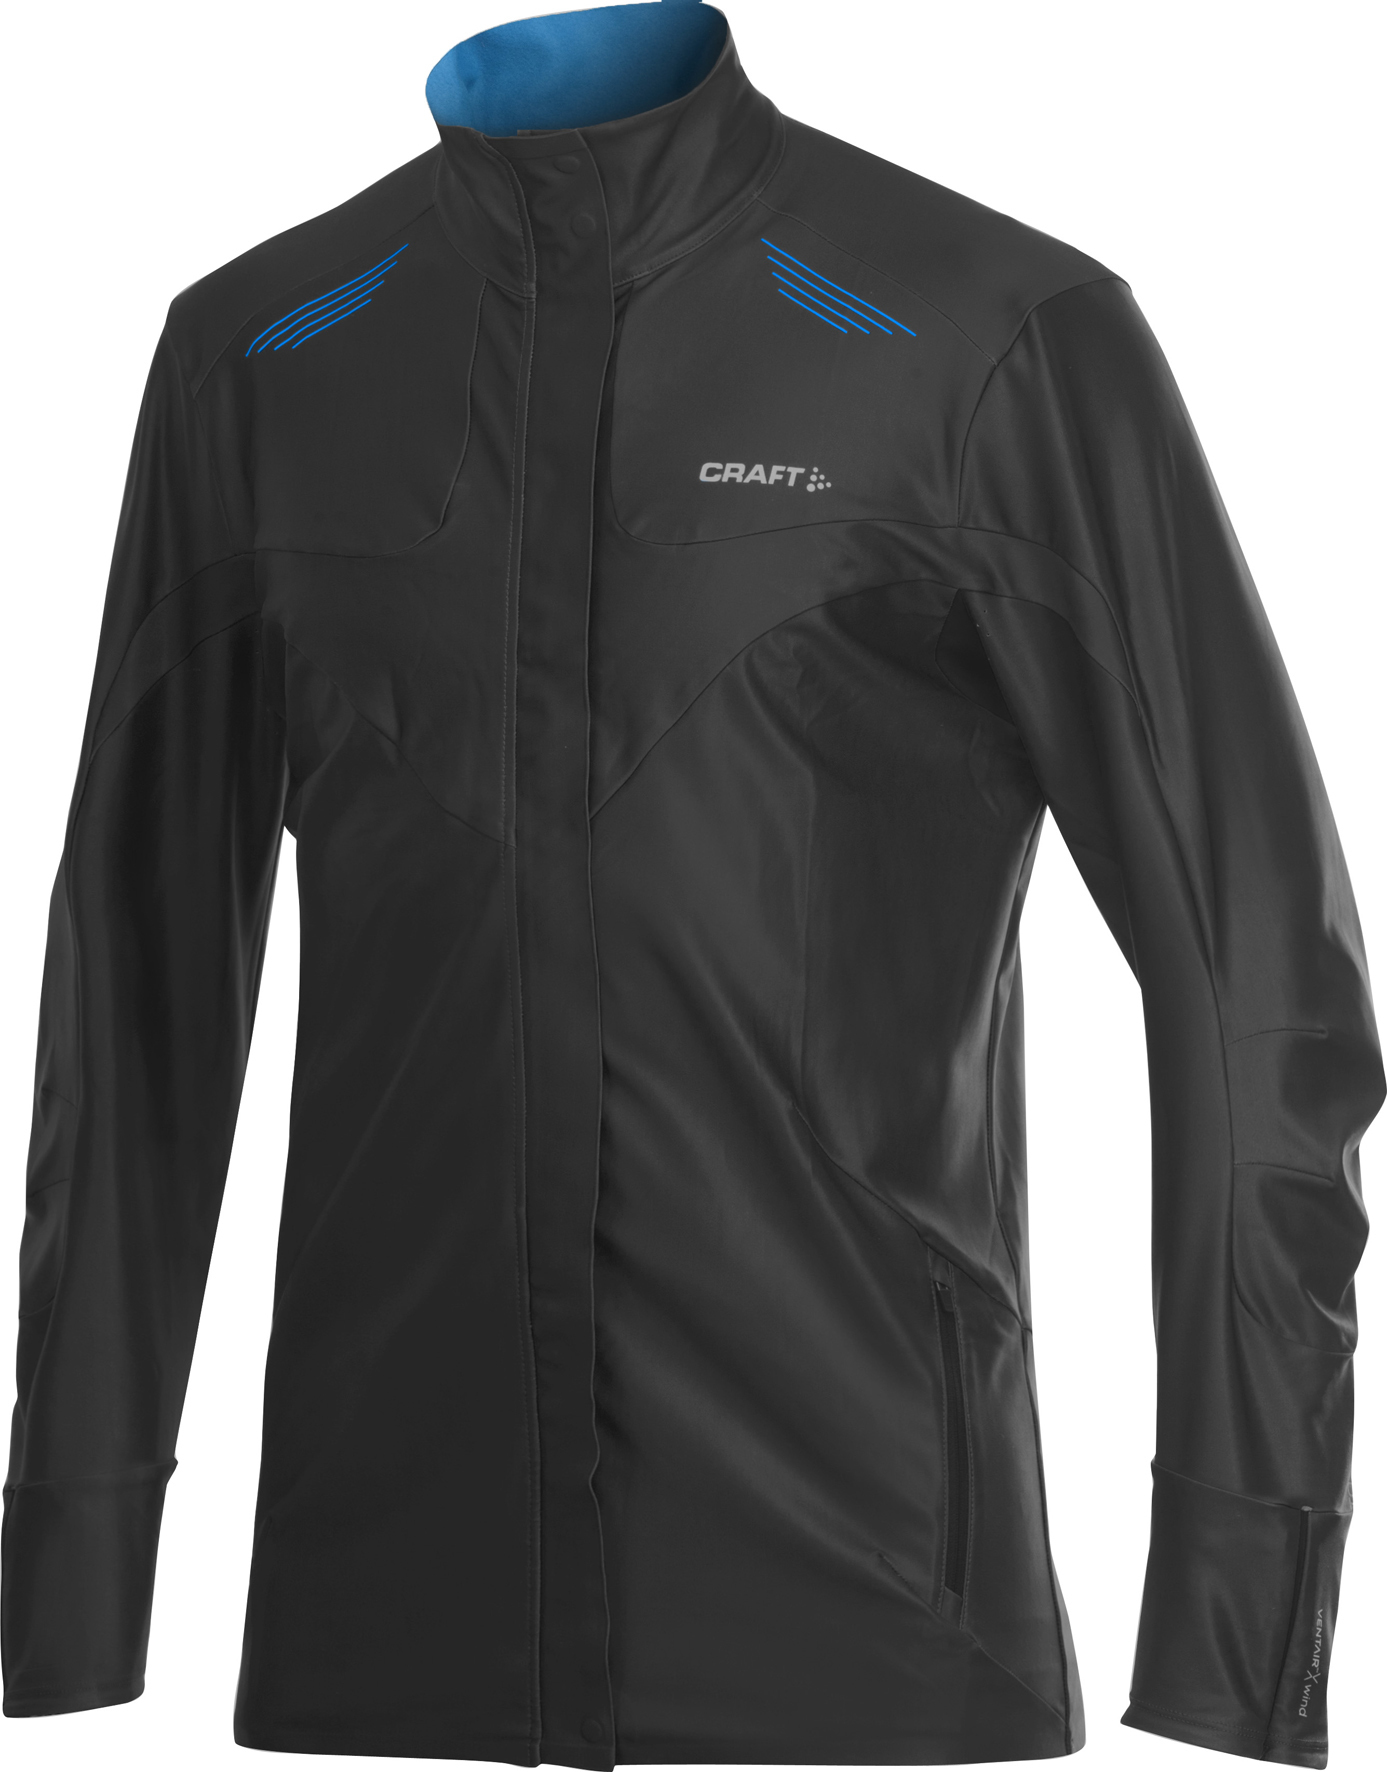 Куртка Craft Elite Race мужская чёрная